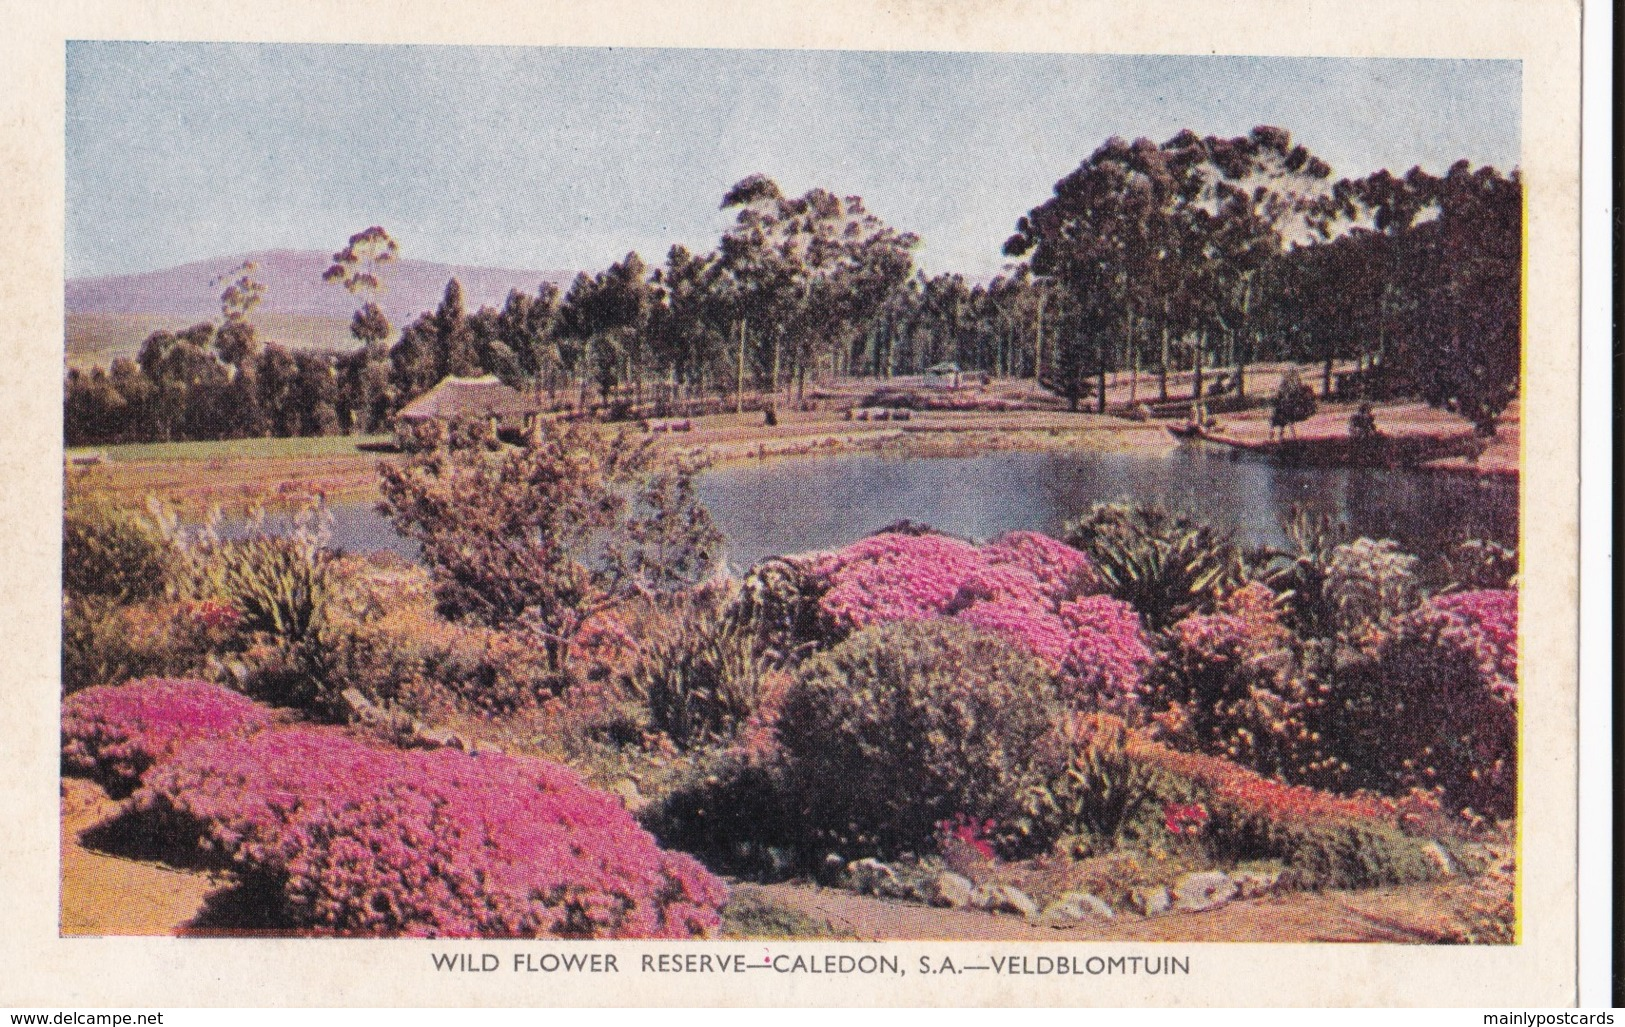 AP56 Wild Flower Reserve, Caledon, S.A., Veldbloemtuin - South Africa